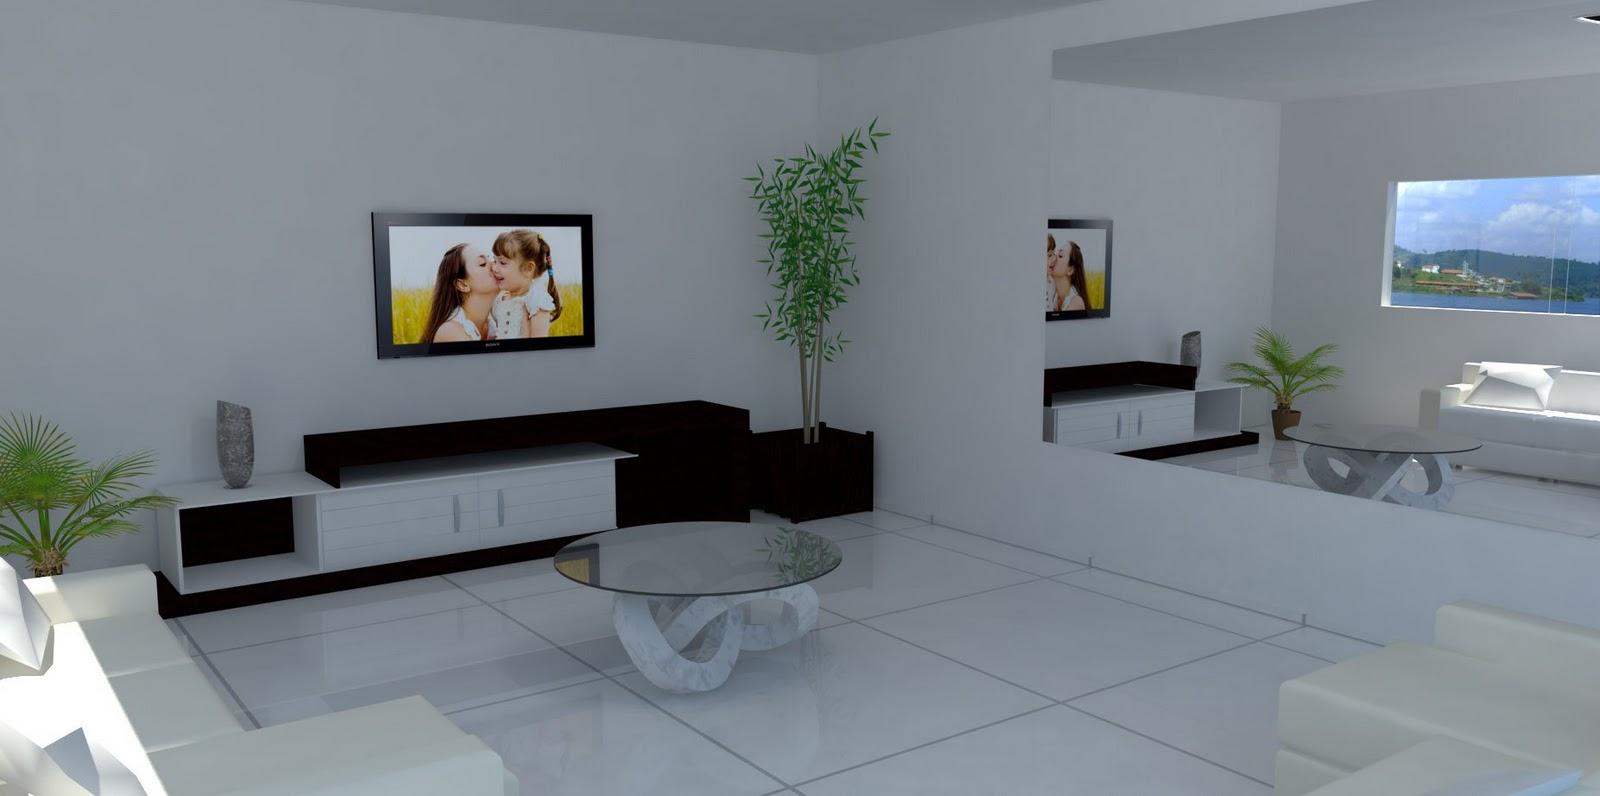 Realidade Virtual Maquetes Eletrônicas #7B7136 1600 796